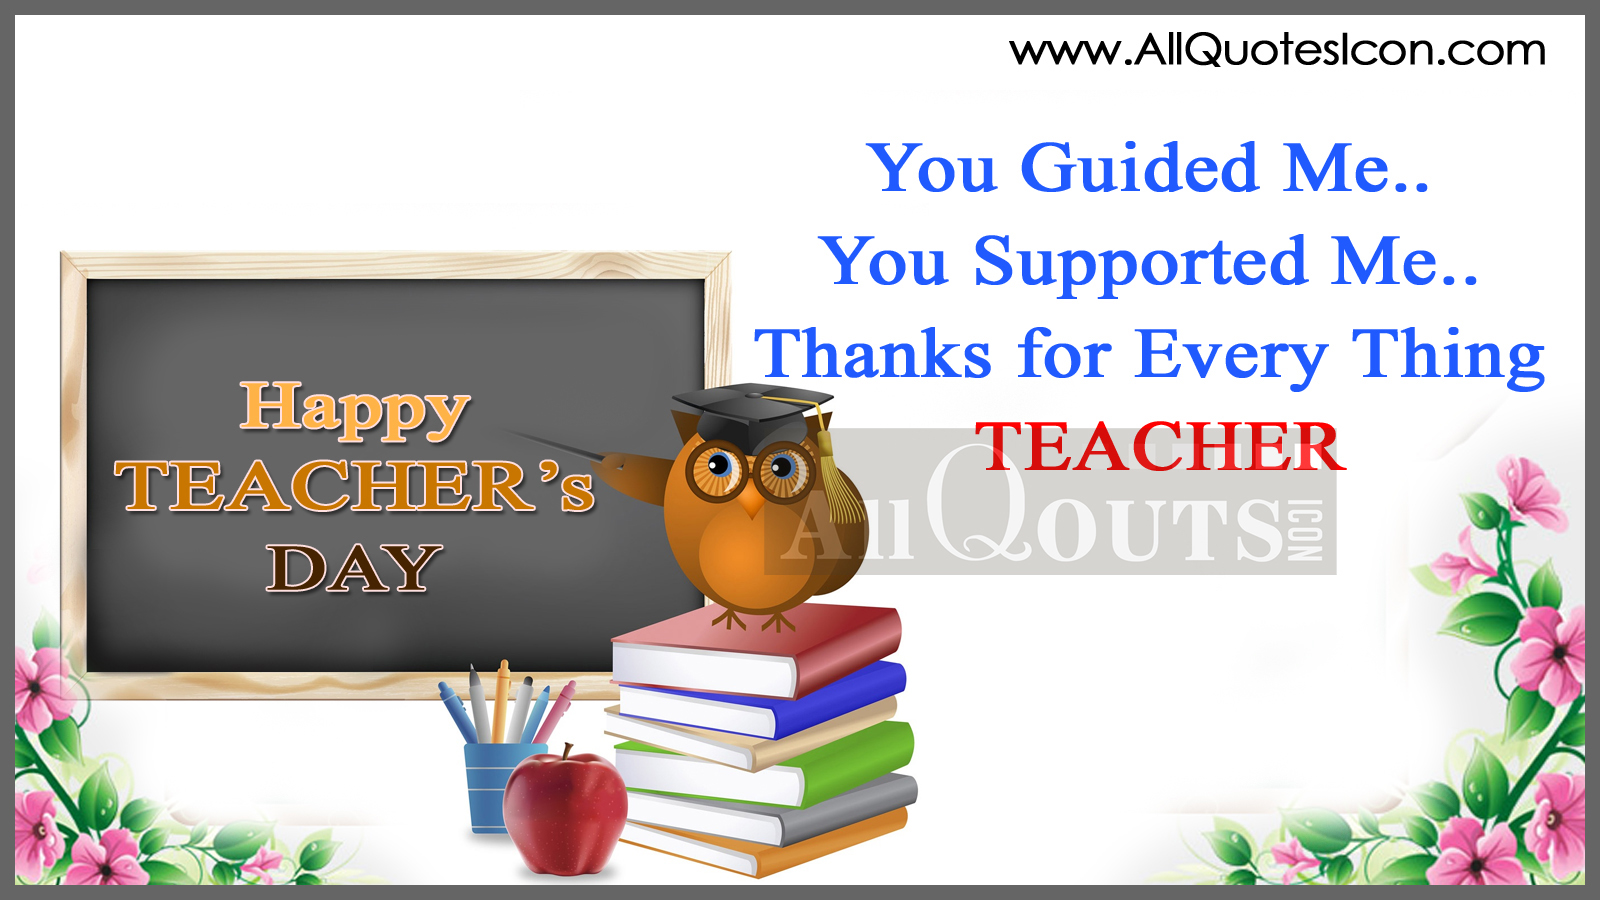 Teachers day hd wallpapers in telugu teachers day greetings in happy teachers day teachers day 2015 teachers day speech teachers day quotes altavistaventures Images